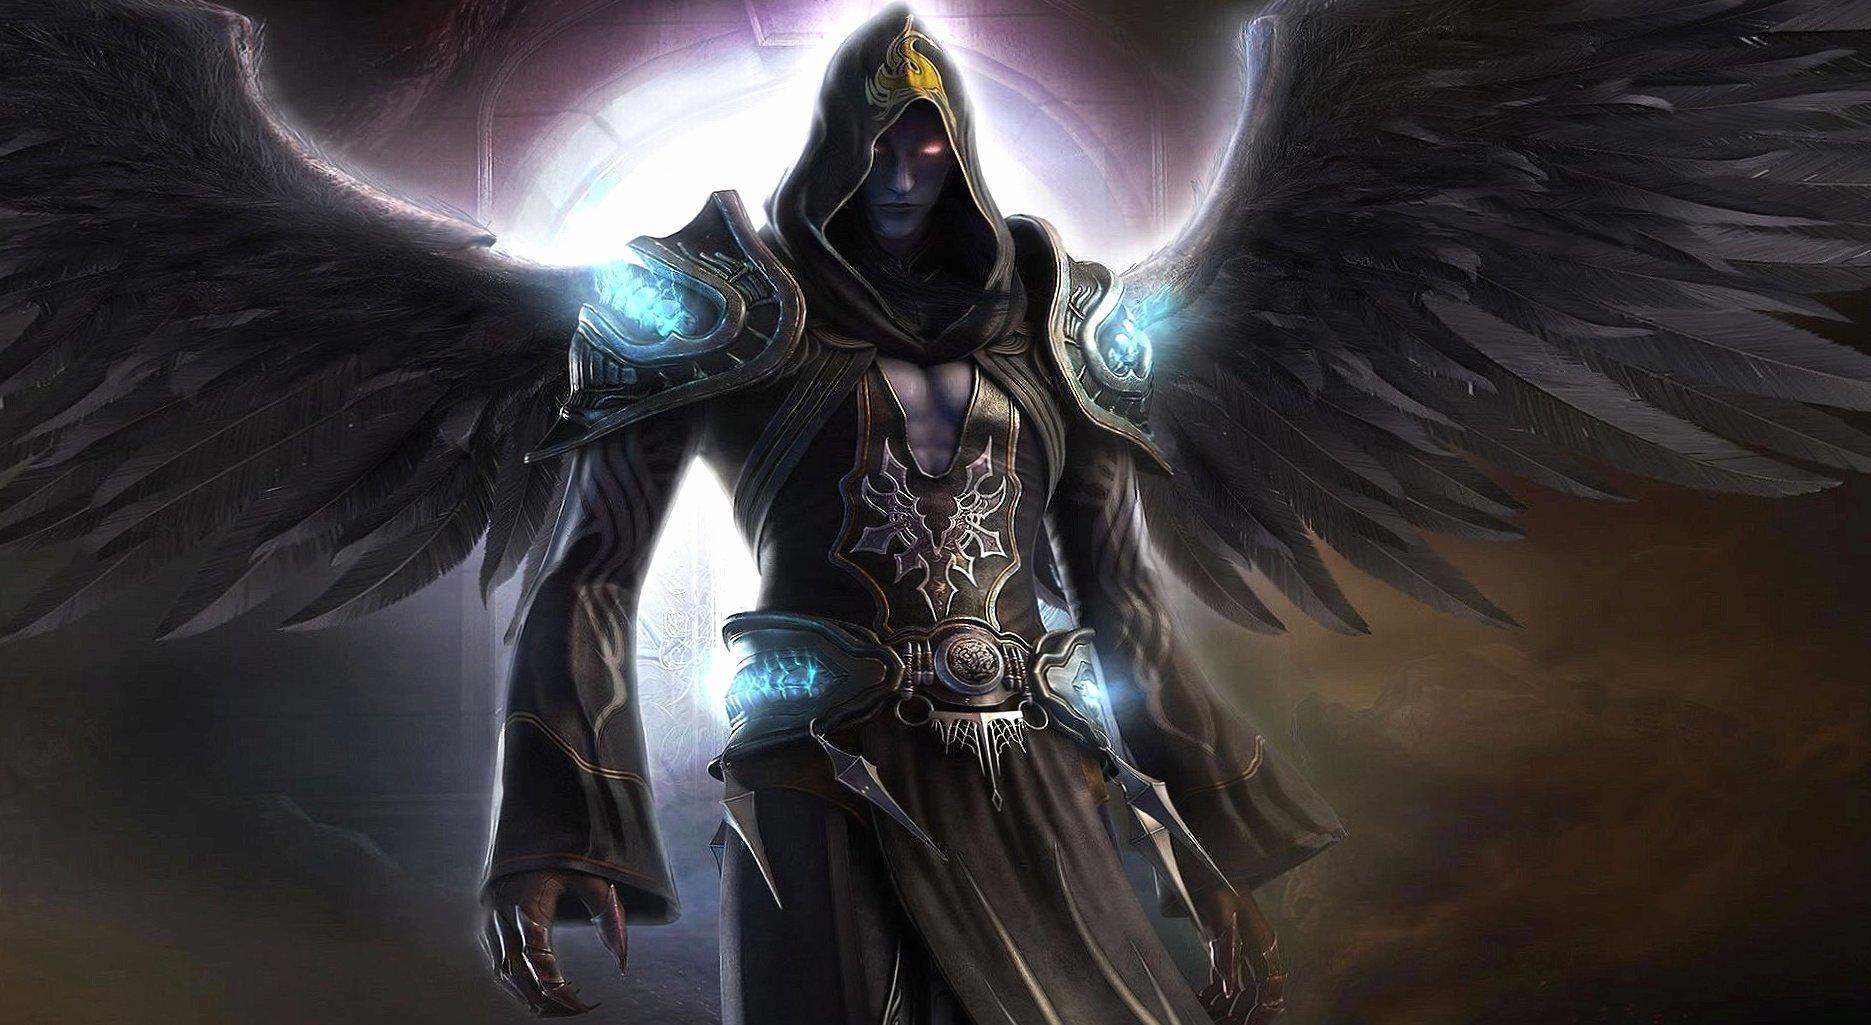 Black angel dark wallpapers HD quality